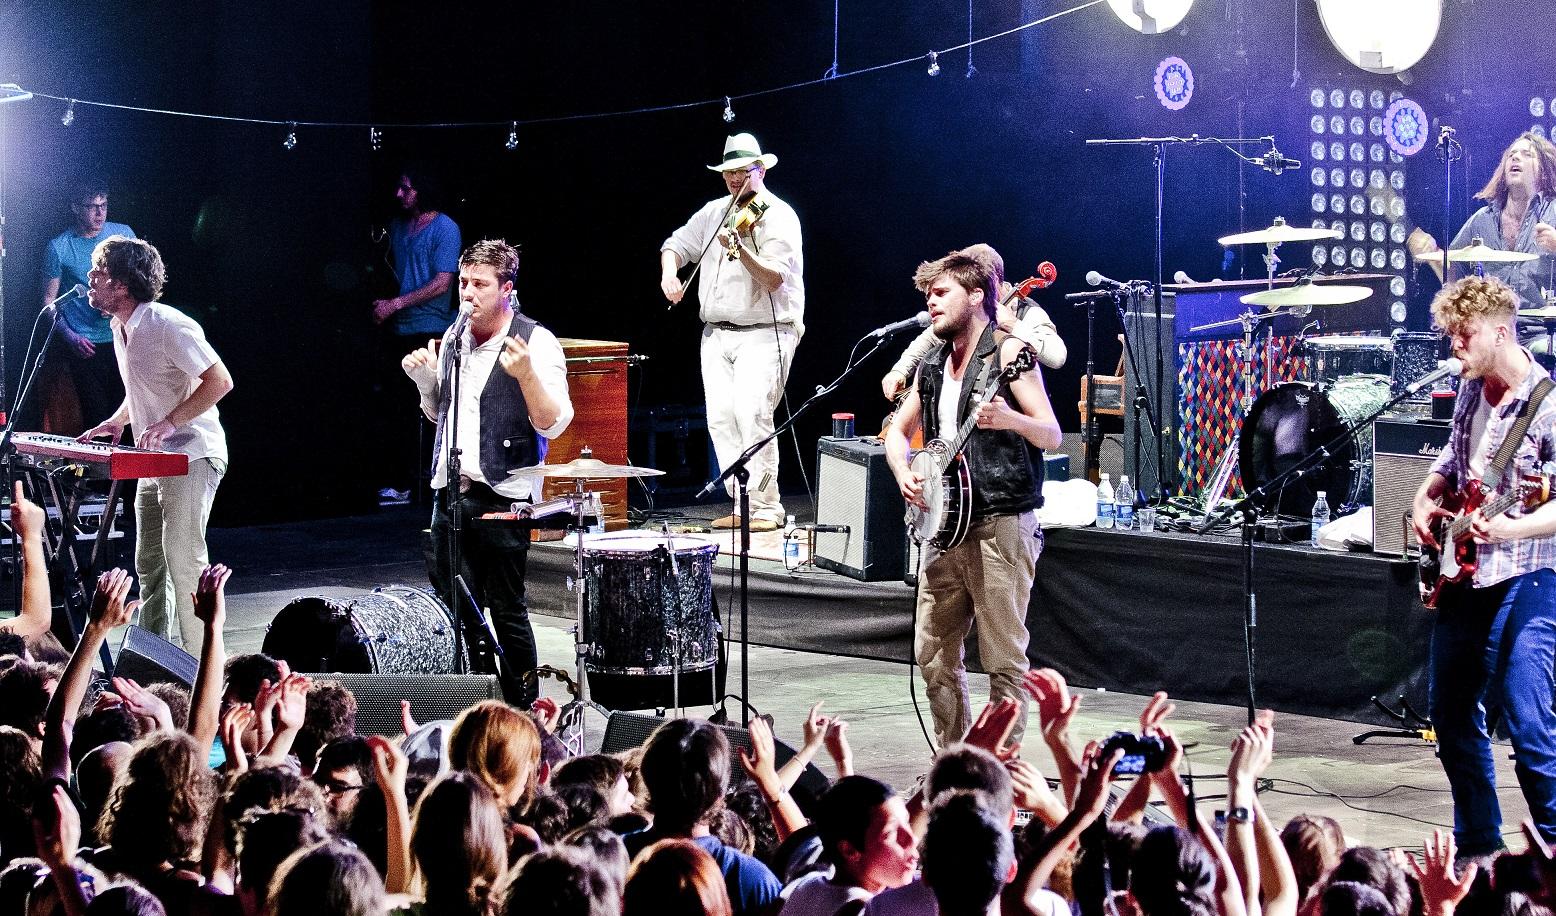 Mumford_&_Sons_in_Teatro_Romano_Verona_2012_edited